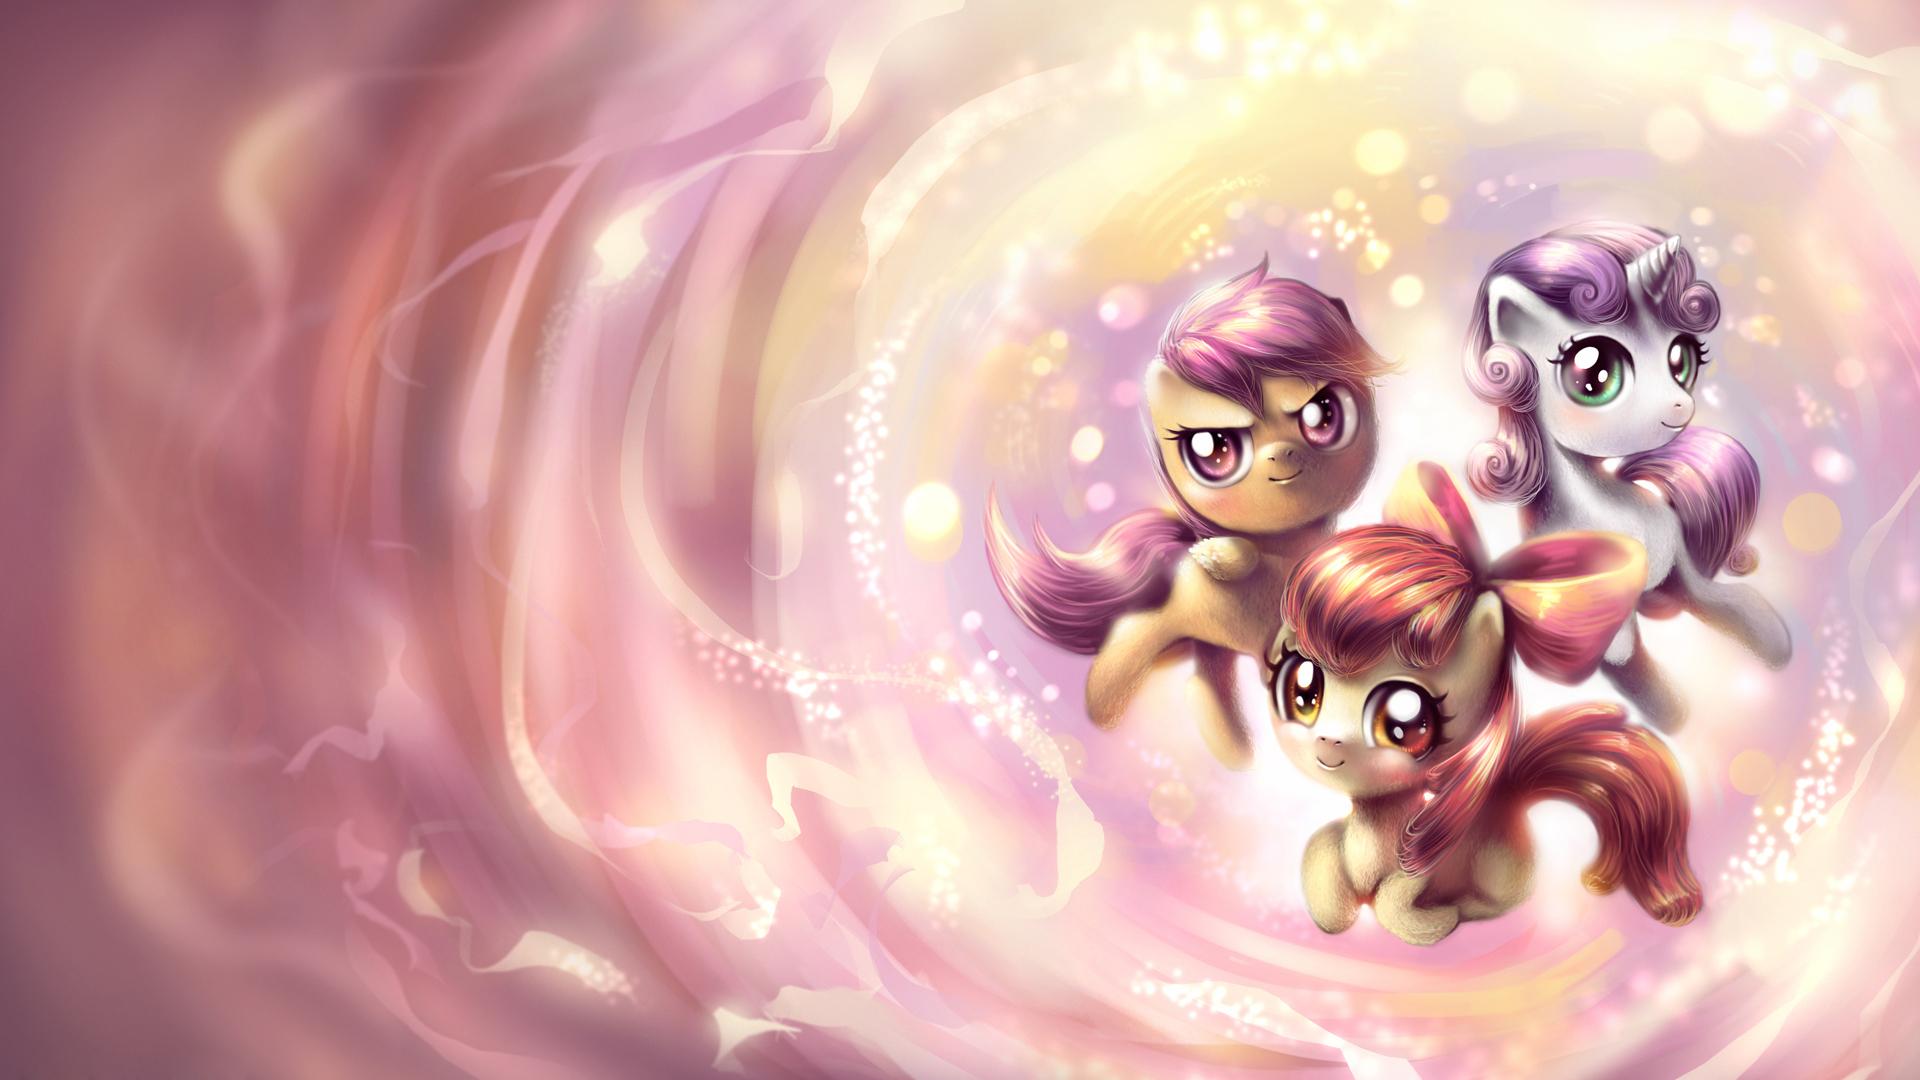 Fonds d 39 ecran 1920x1080 my little pony dessins anim s t l charger photo - My little pony dessin anime ...